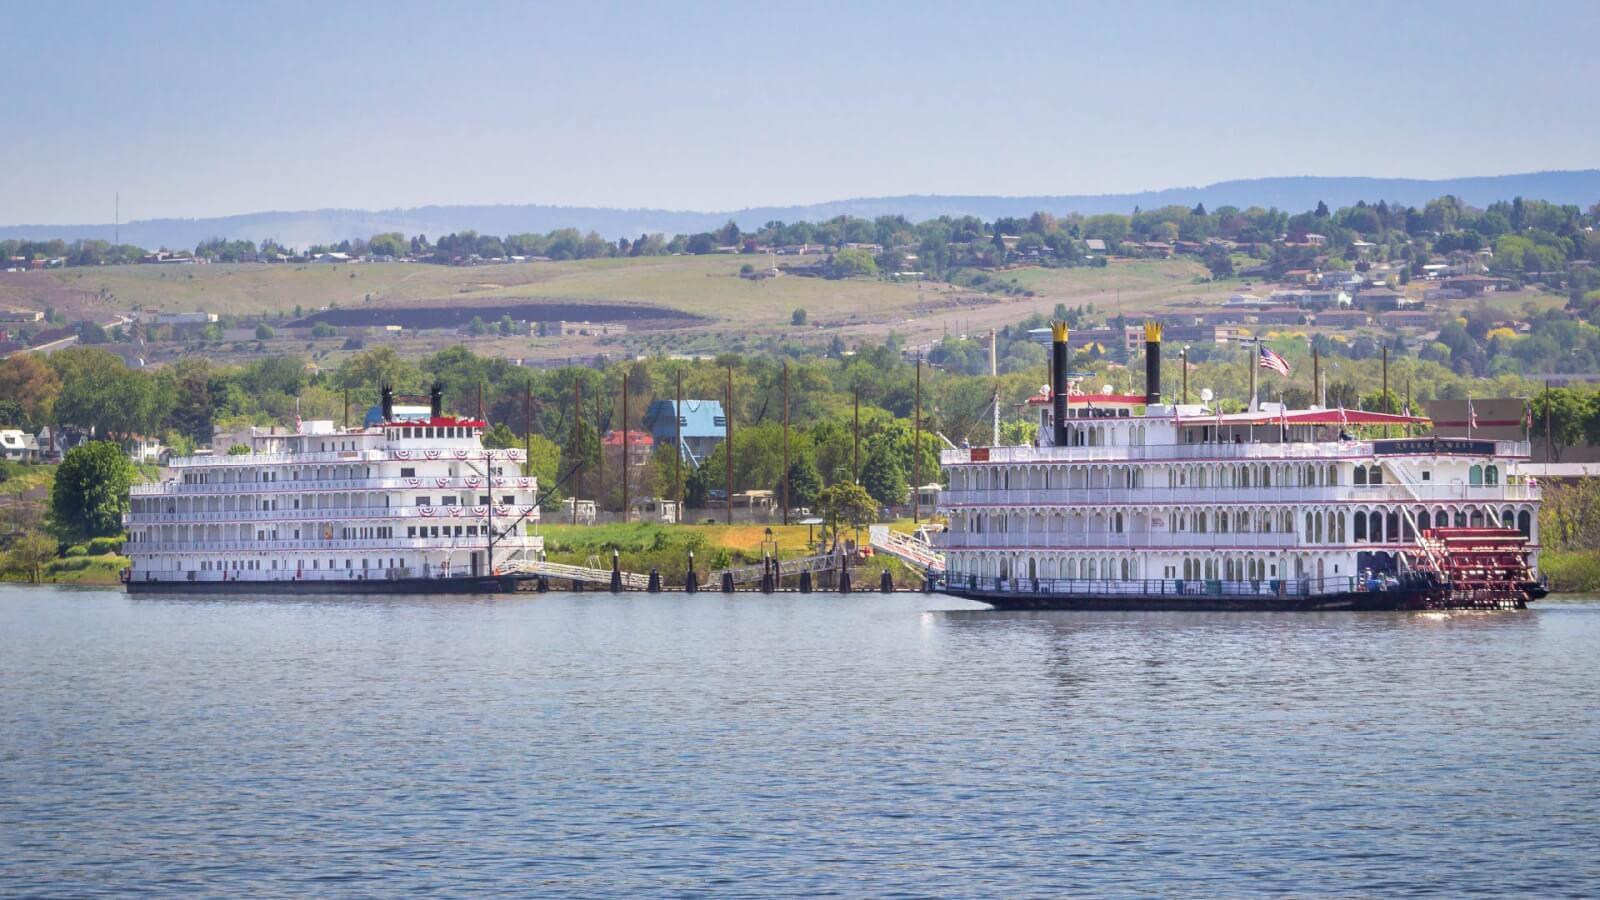 Cruise Ships docking in Clarkston, WA